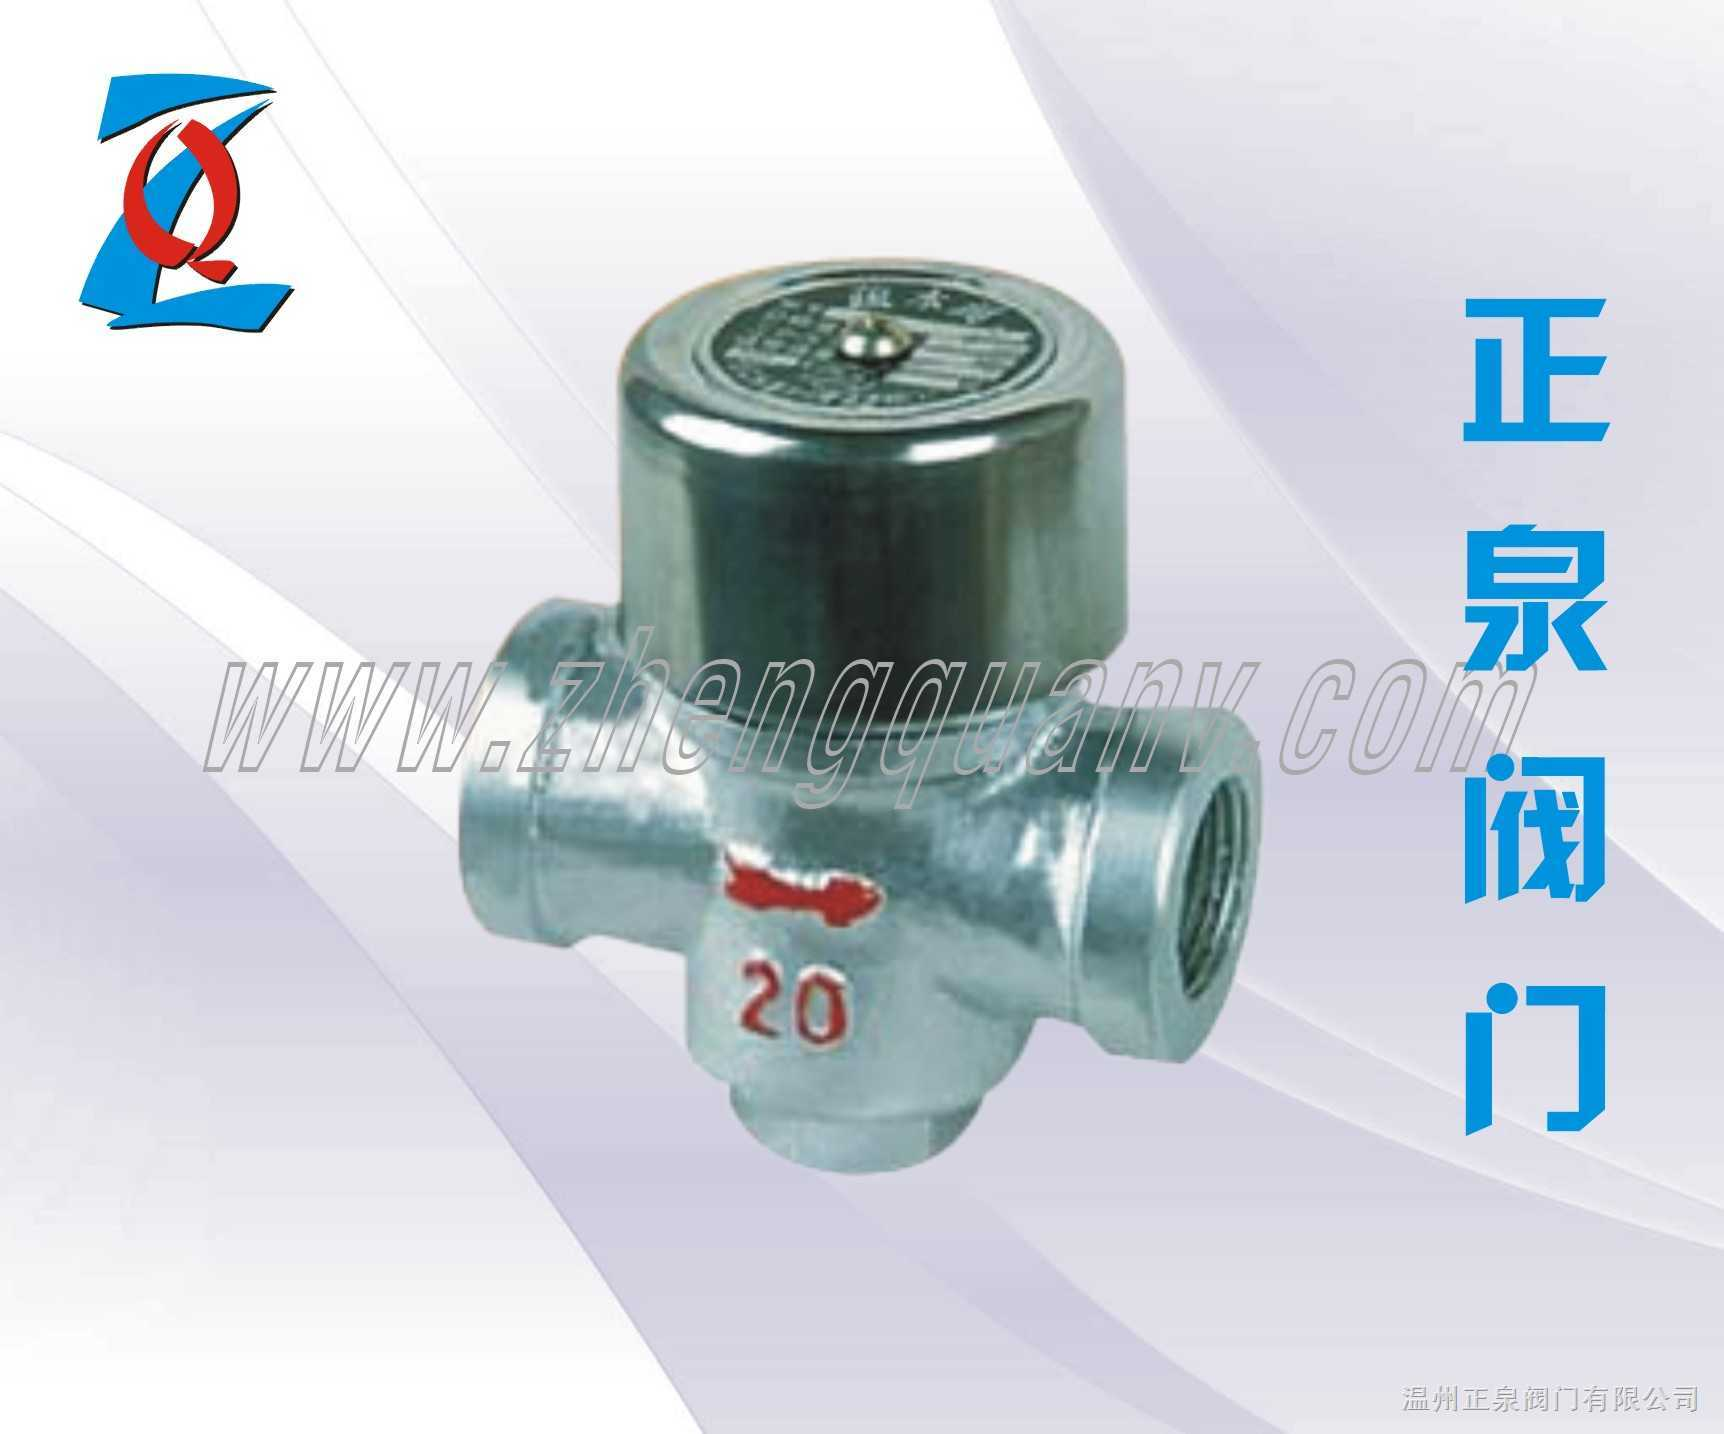 cs19h/w 热动力圆盘式蒸汽疏水阀图片